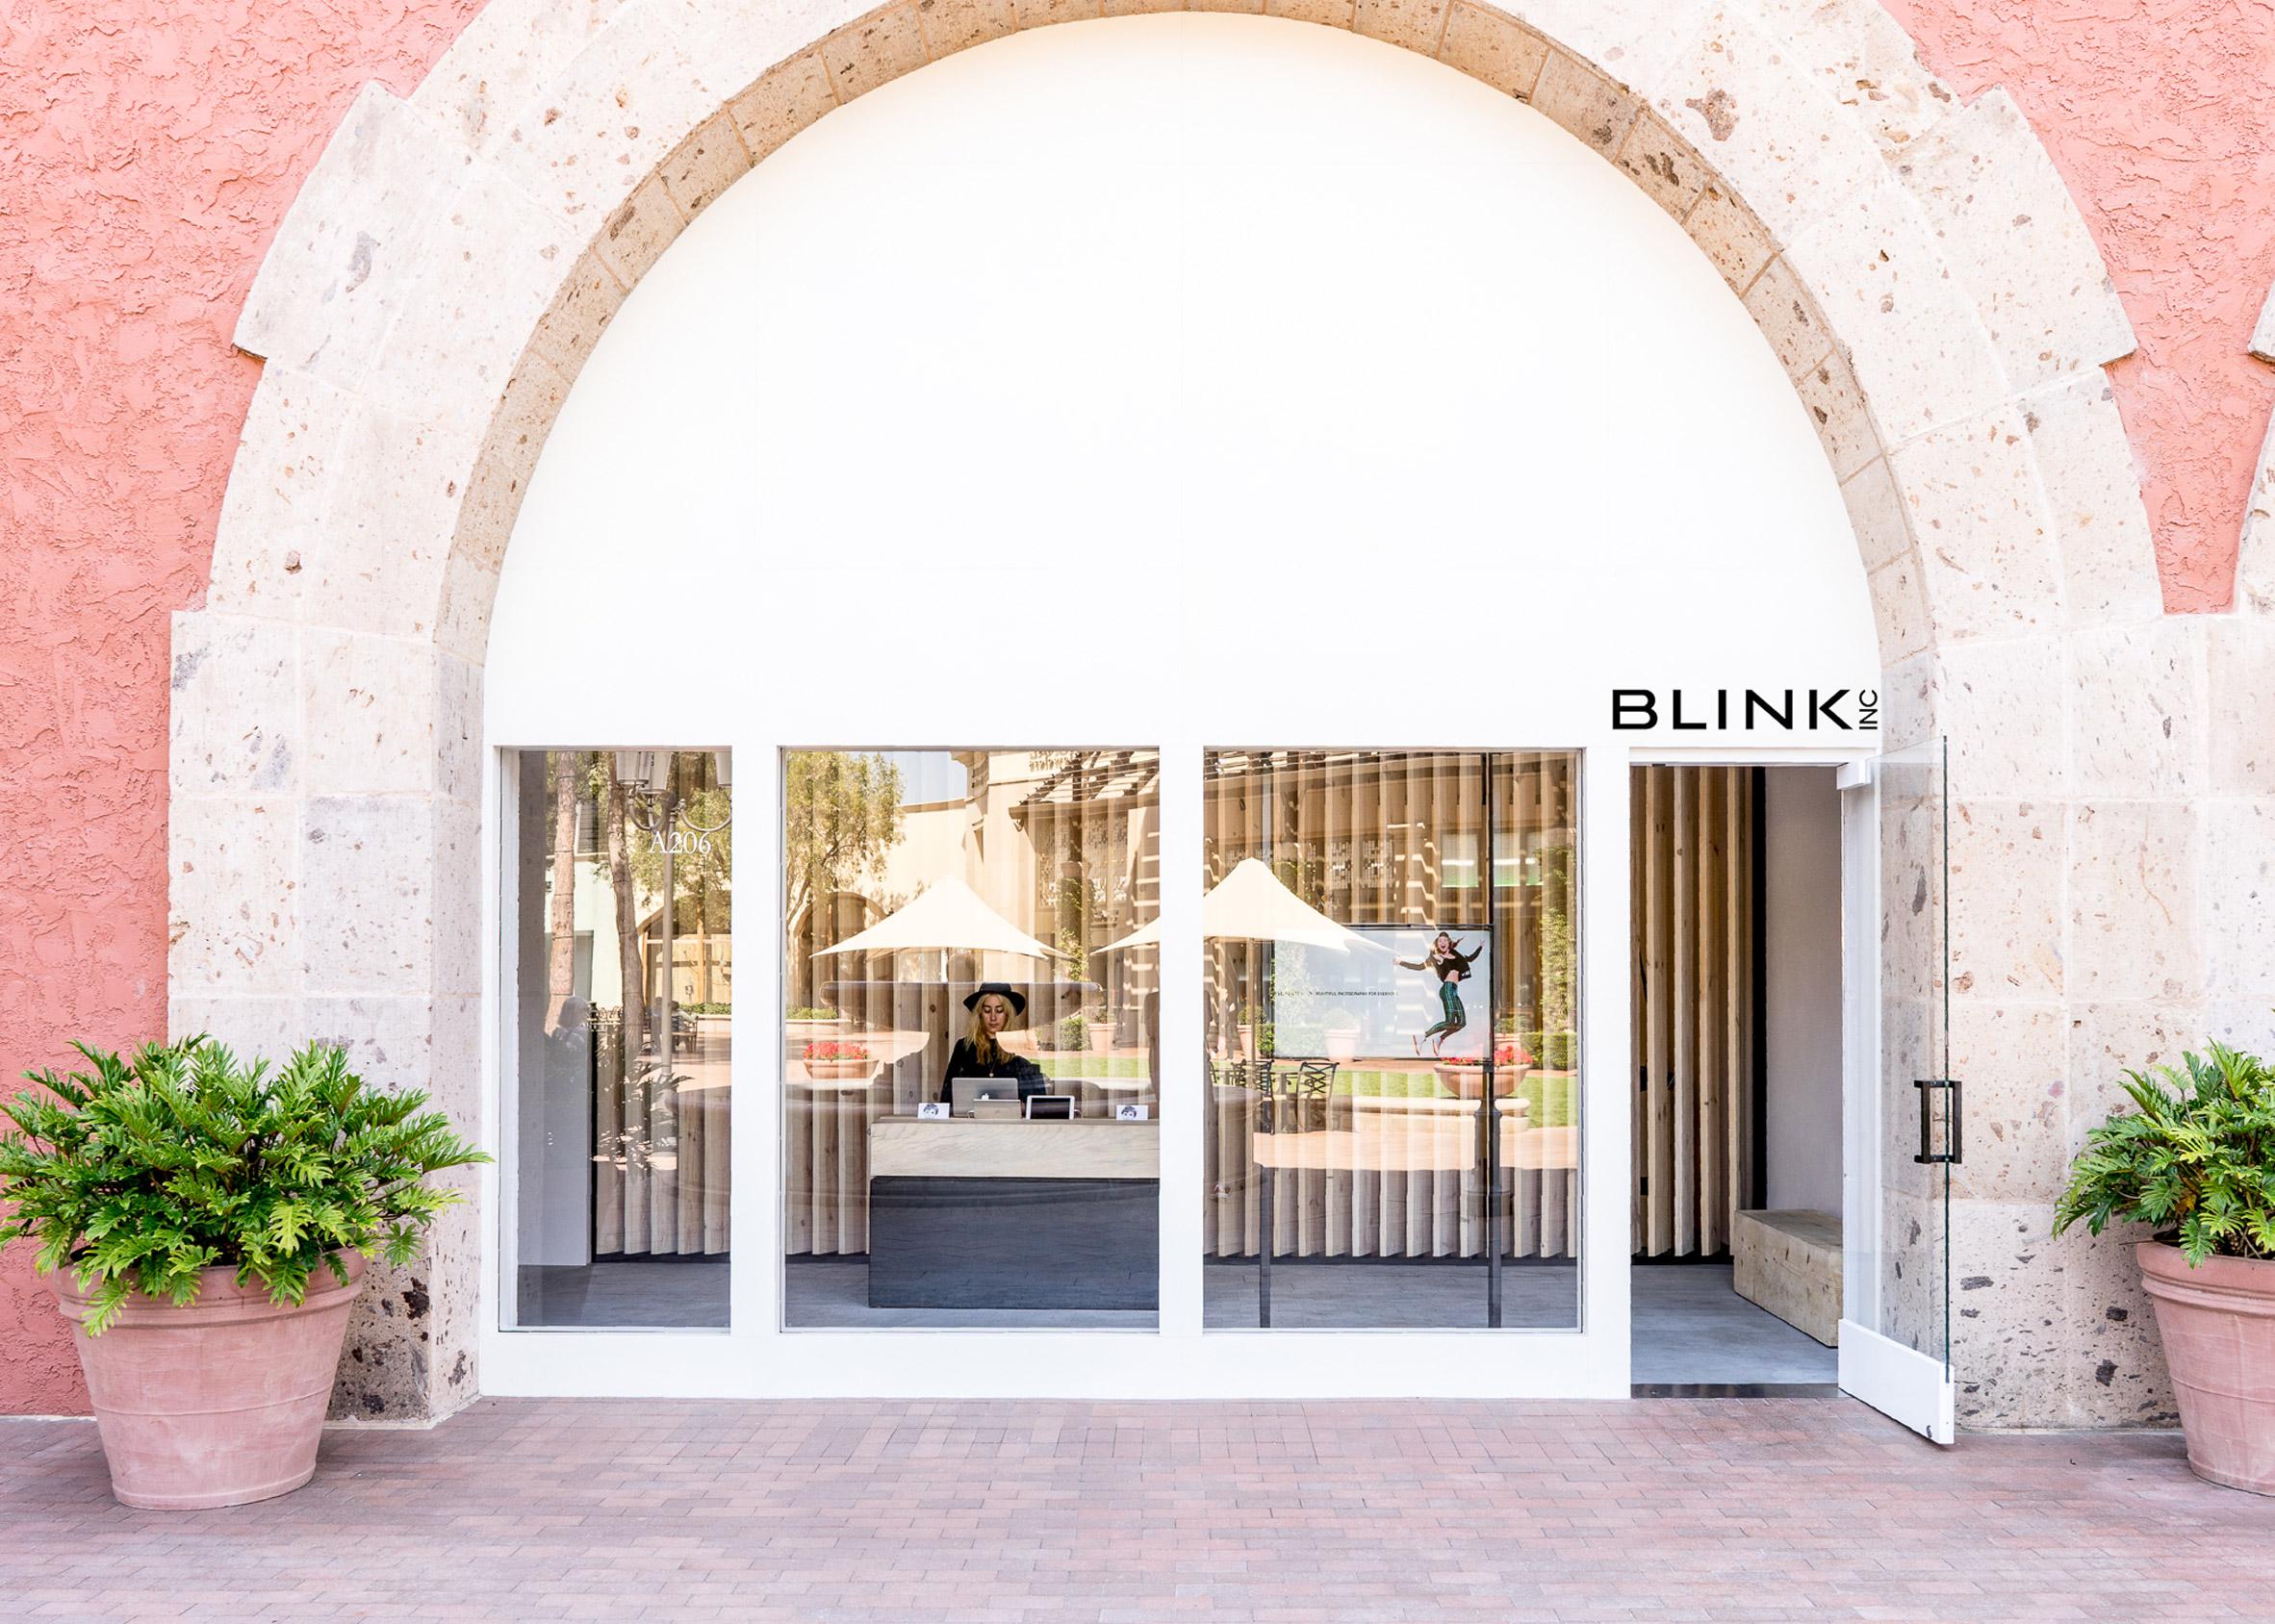 Blink Inc by Rapt Studio